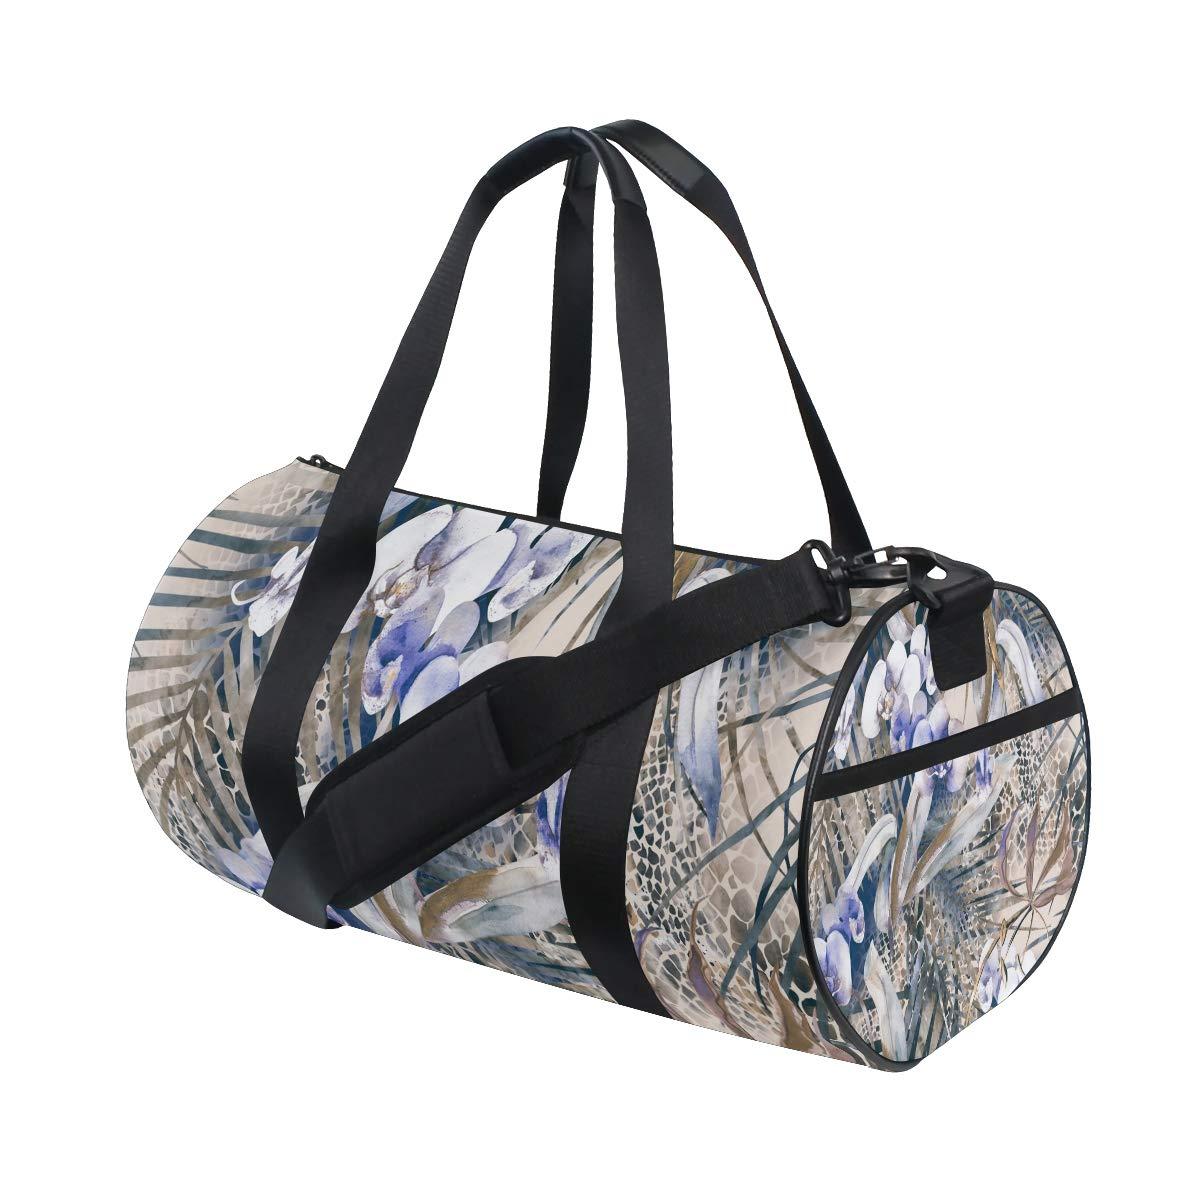 Unisex's Duffel Bag Travel Tote Luggage Bag Gym Sports Luggage Bag